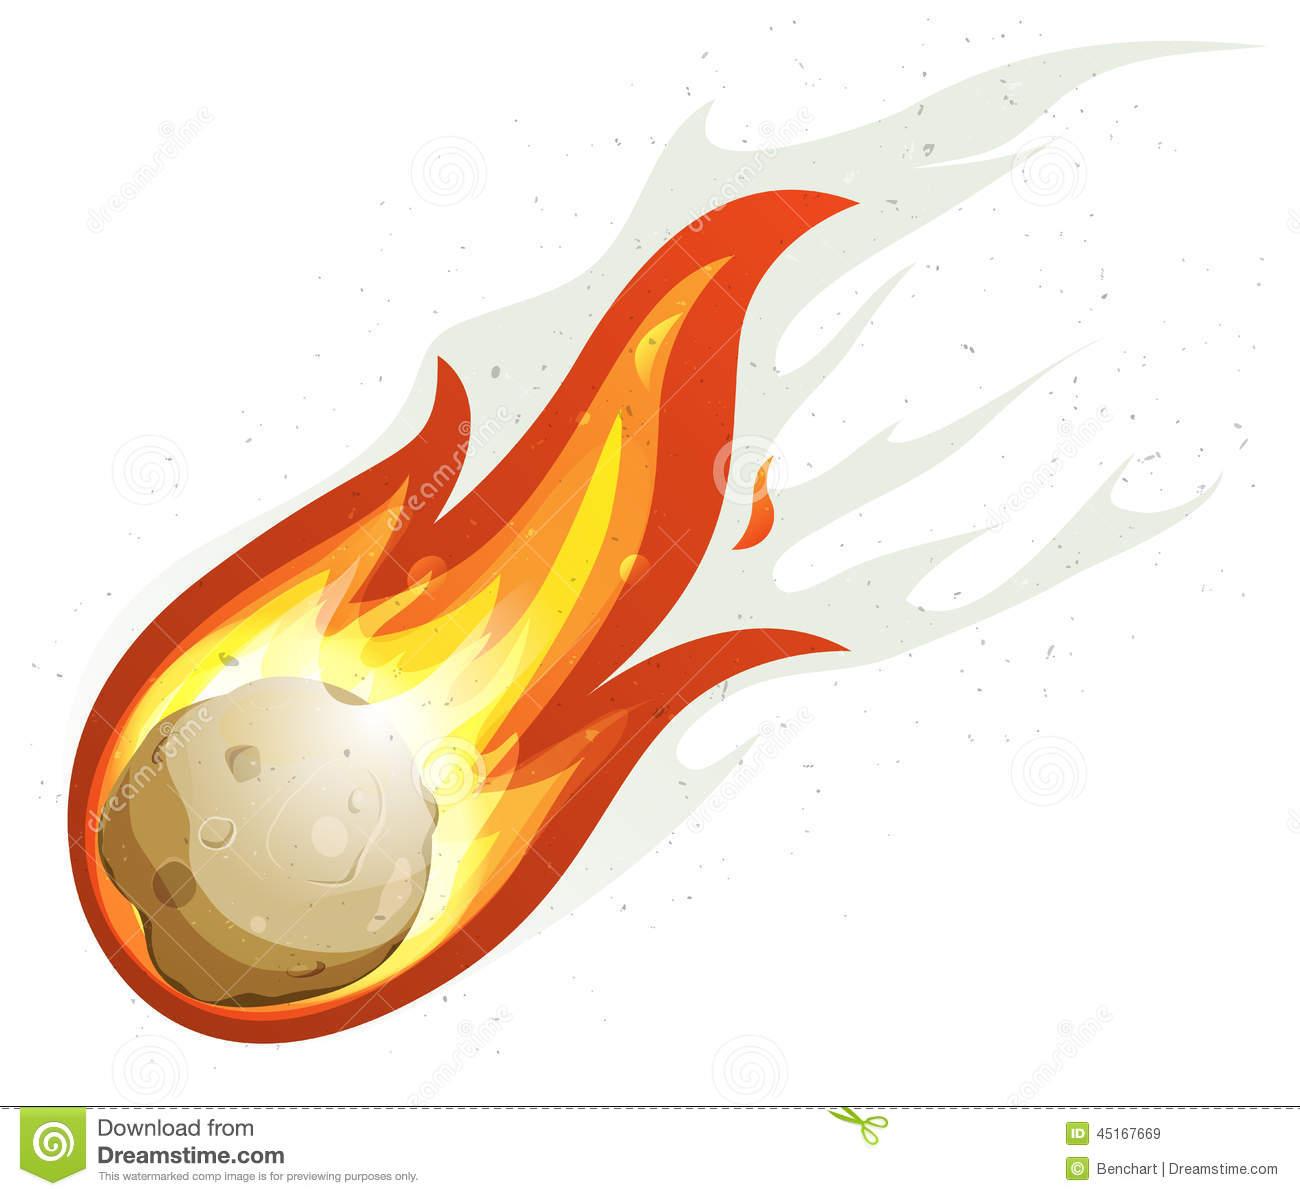 39 Fireball free clipart.